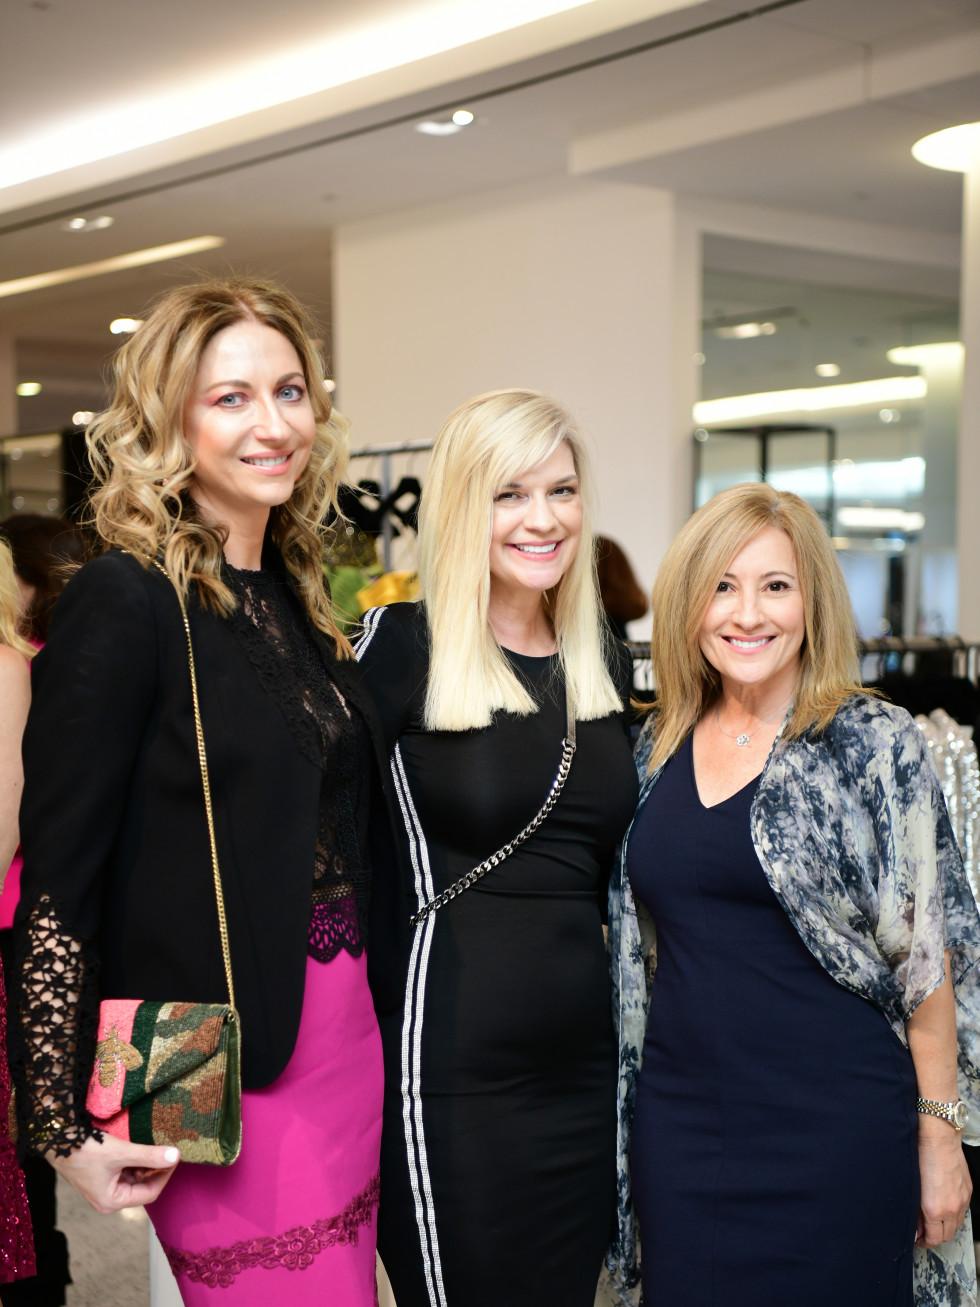 Tootsies Fuschia New Navy 2019 Yelena Grinina, Tammie Johnson and Dena Winkler